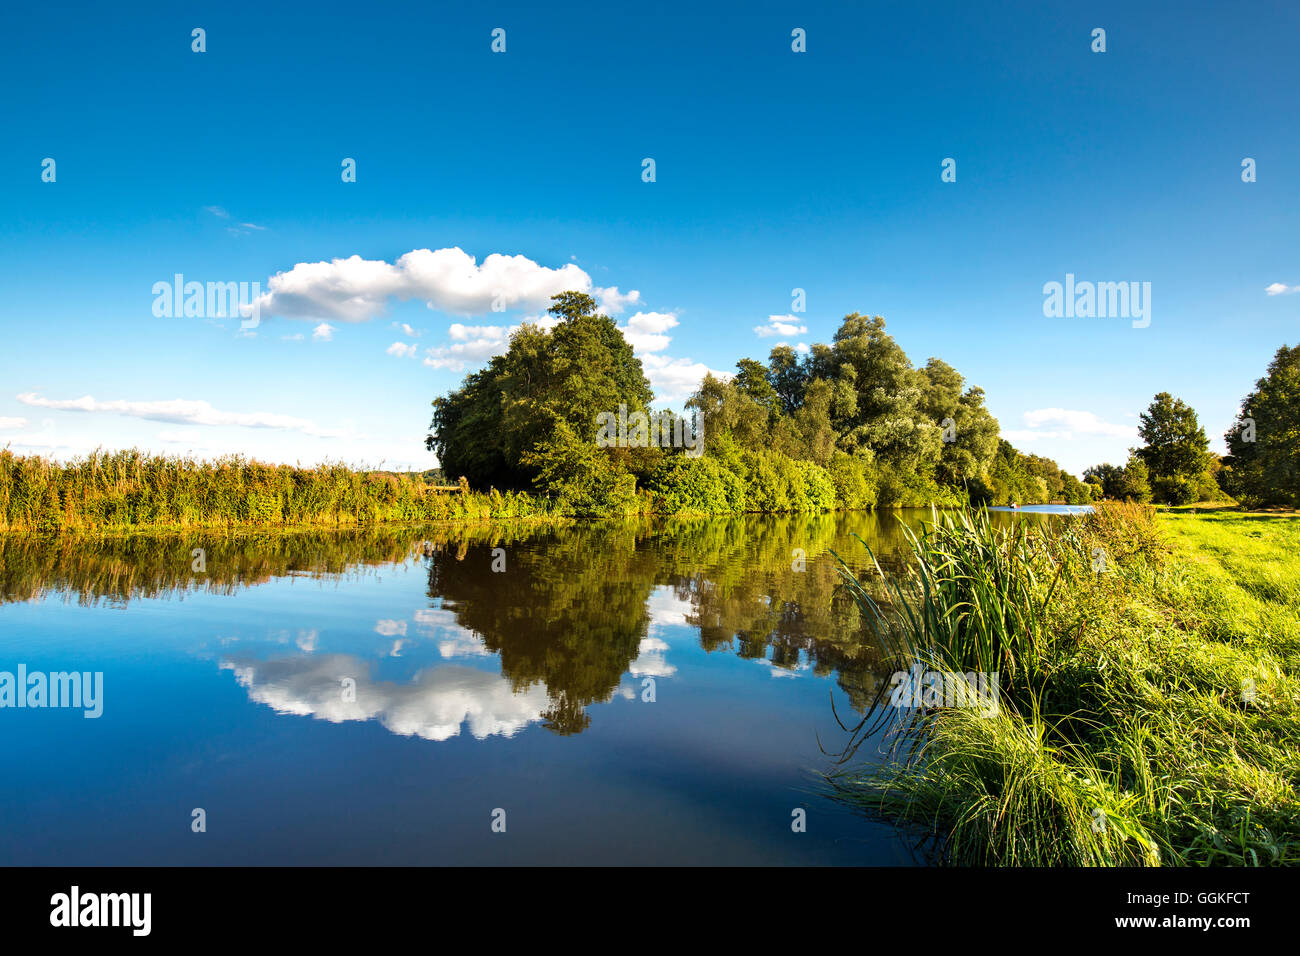 River Hamme, Worpswede, Teufelsmoor, Lower Saxony, Germany - Stock Image